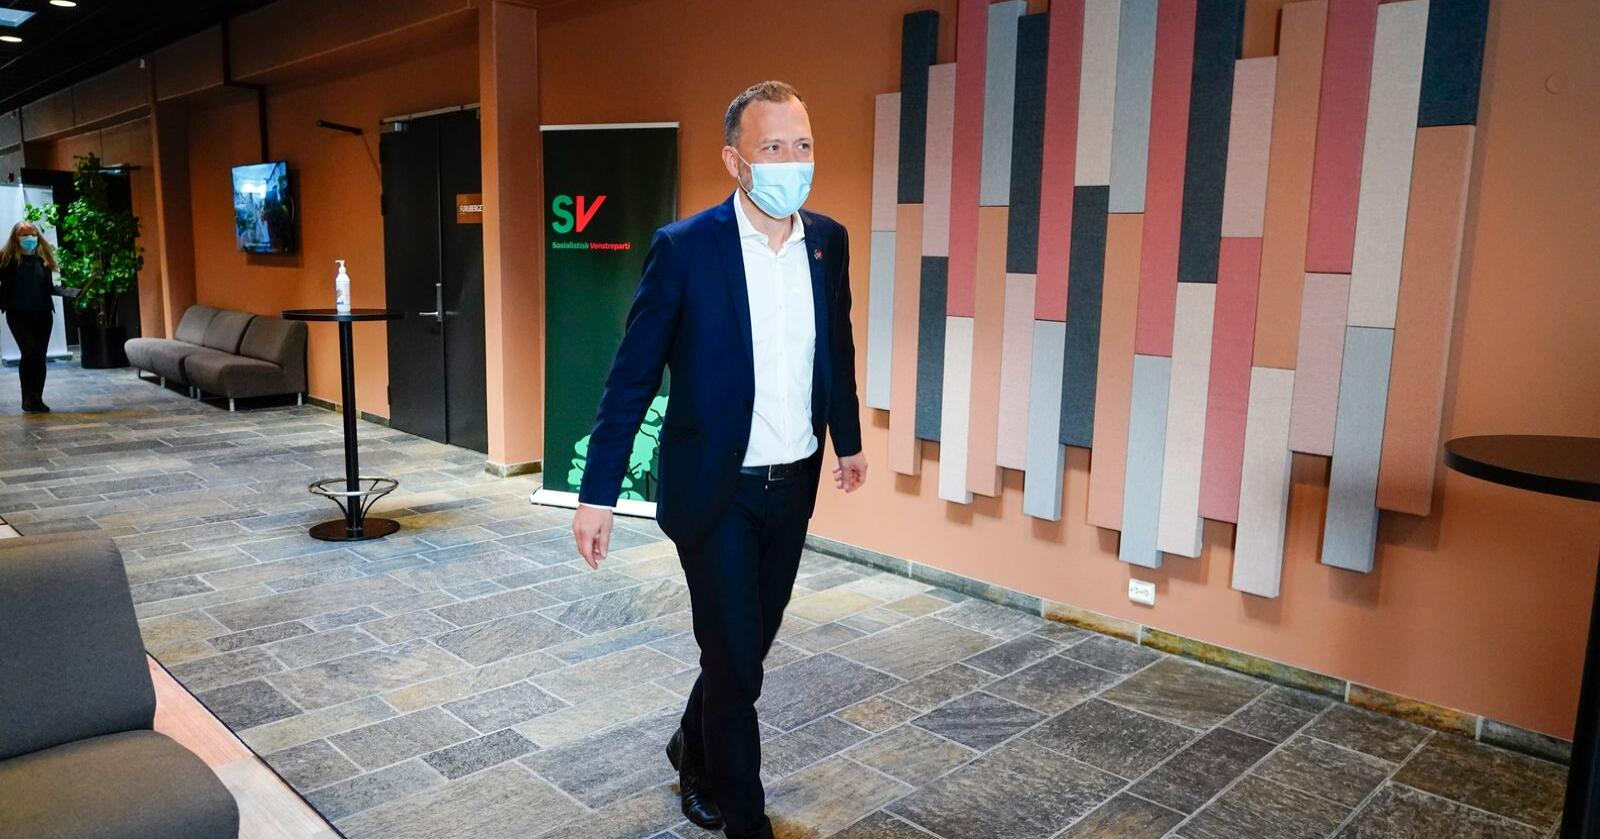 Partileder Audun Lysbakken (SV) under landsmøtet på Hamar fredag.Foto: Terje Pedersen / NTB